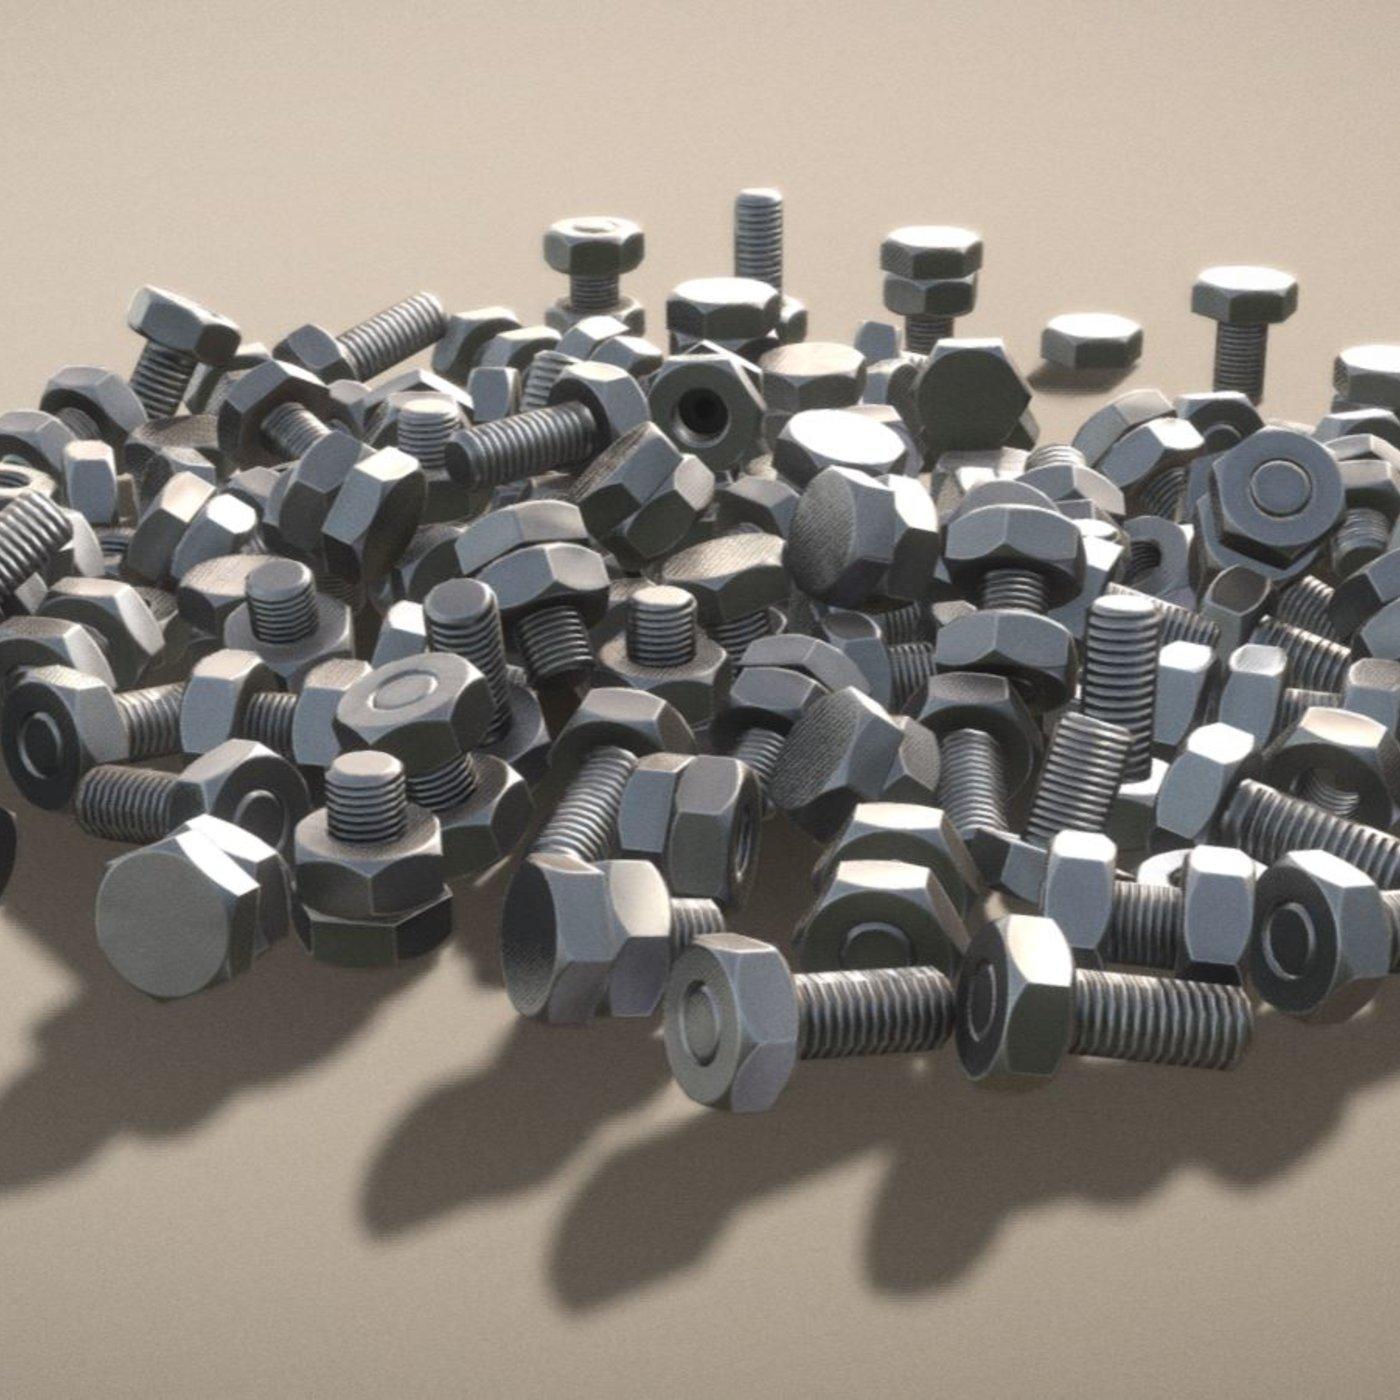 Magnet Animation